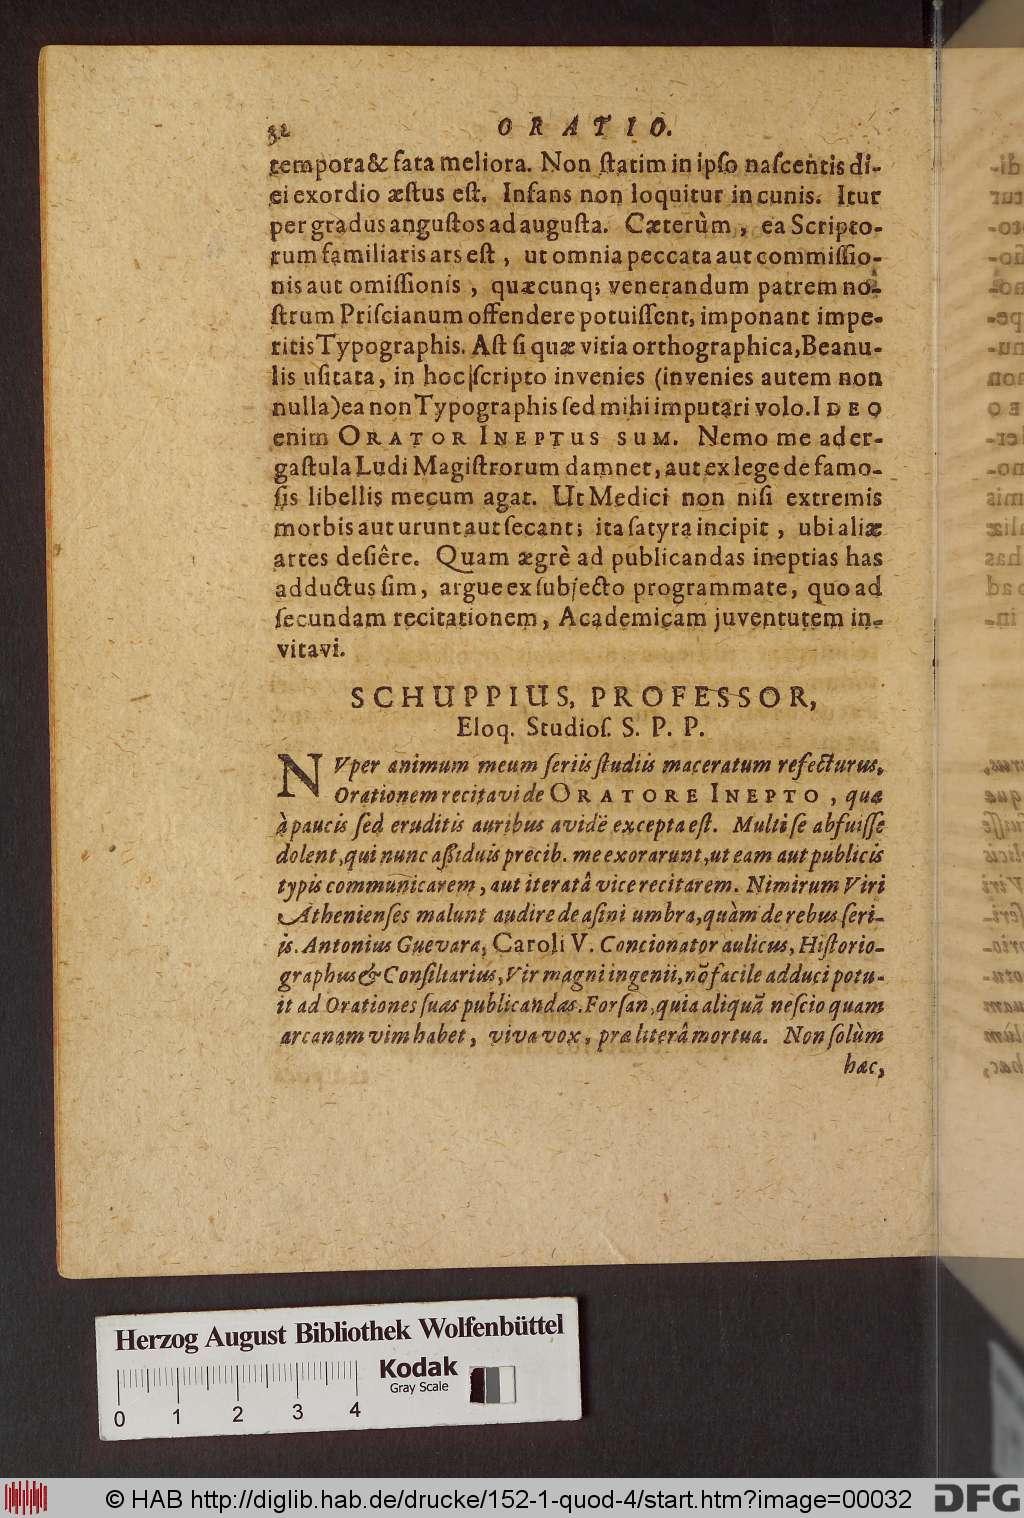 http://diglib.hab.de/drucke/152-1-quod-4/00032.jpg